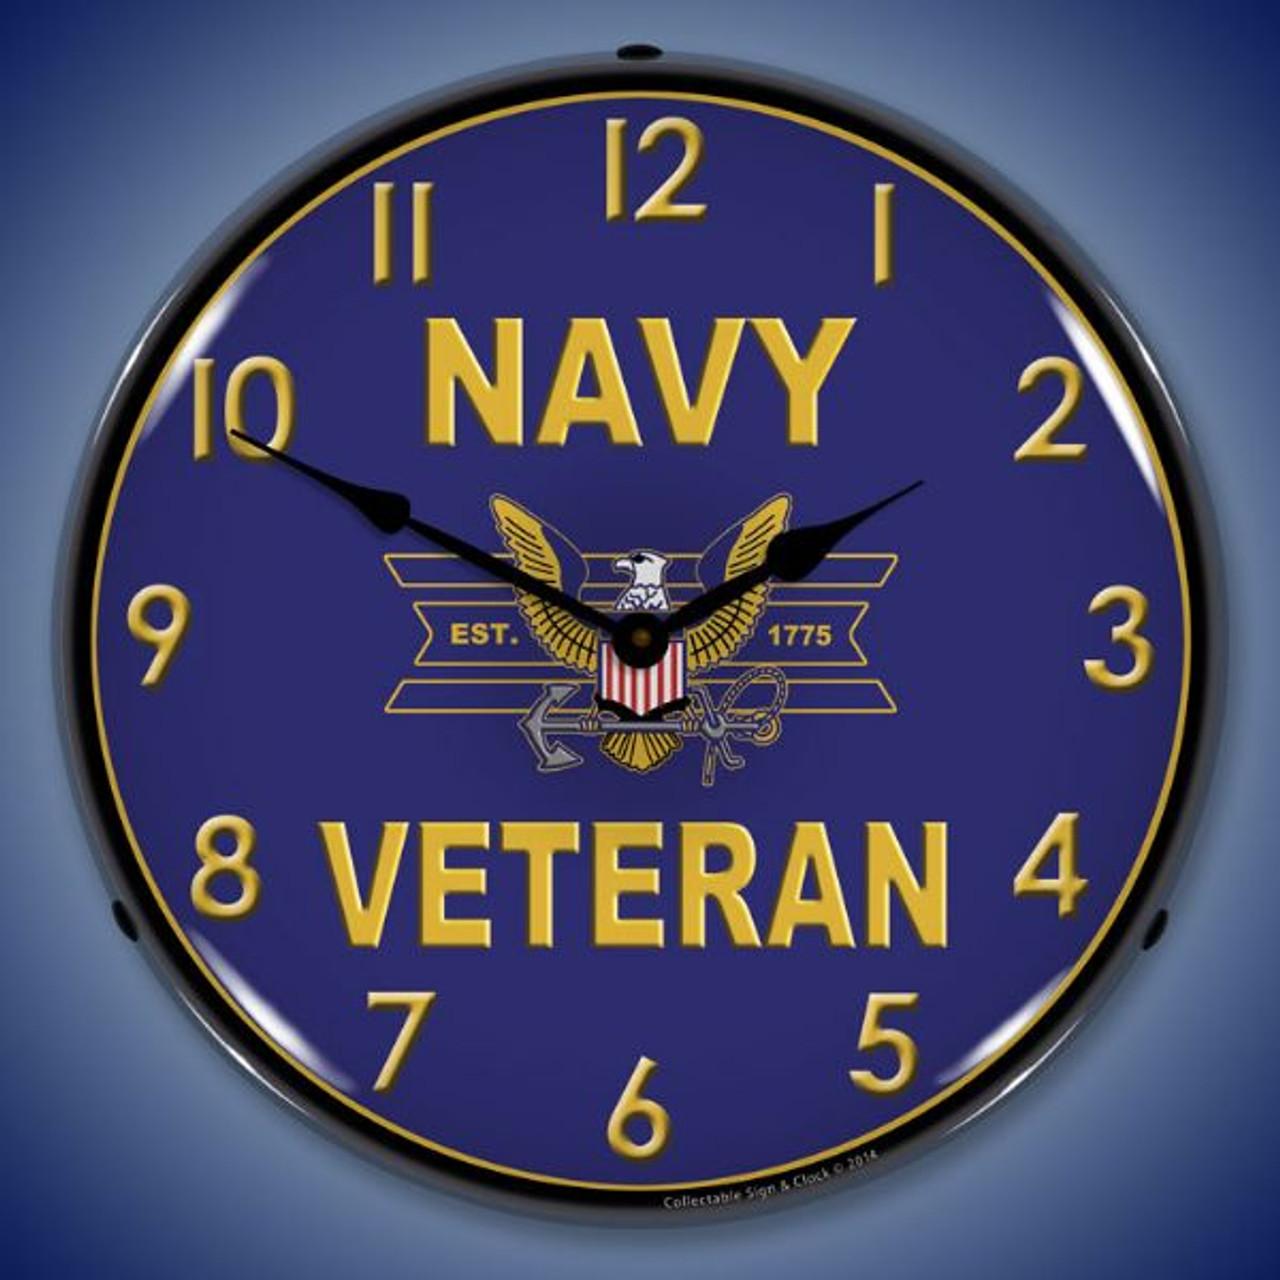 Navy Veteran Lighted Wall Clock 14 x 14 Inches